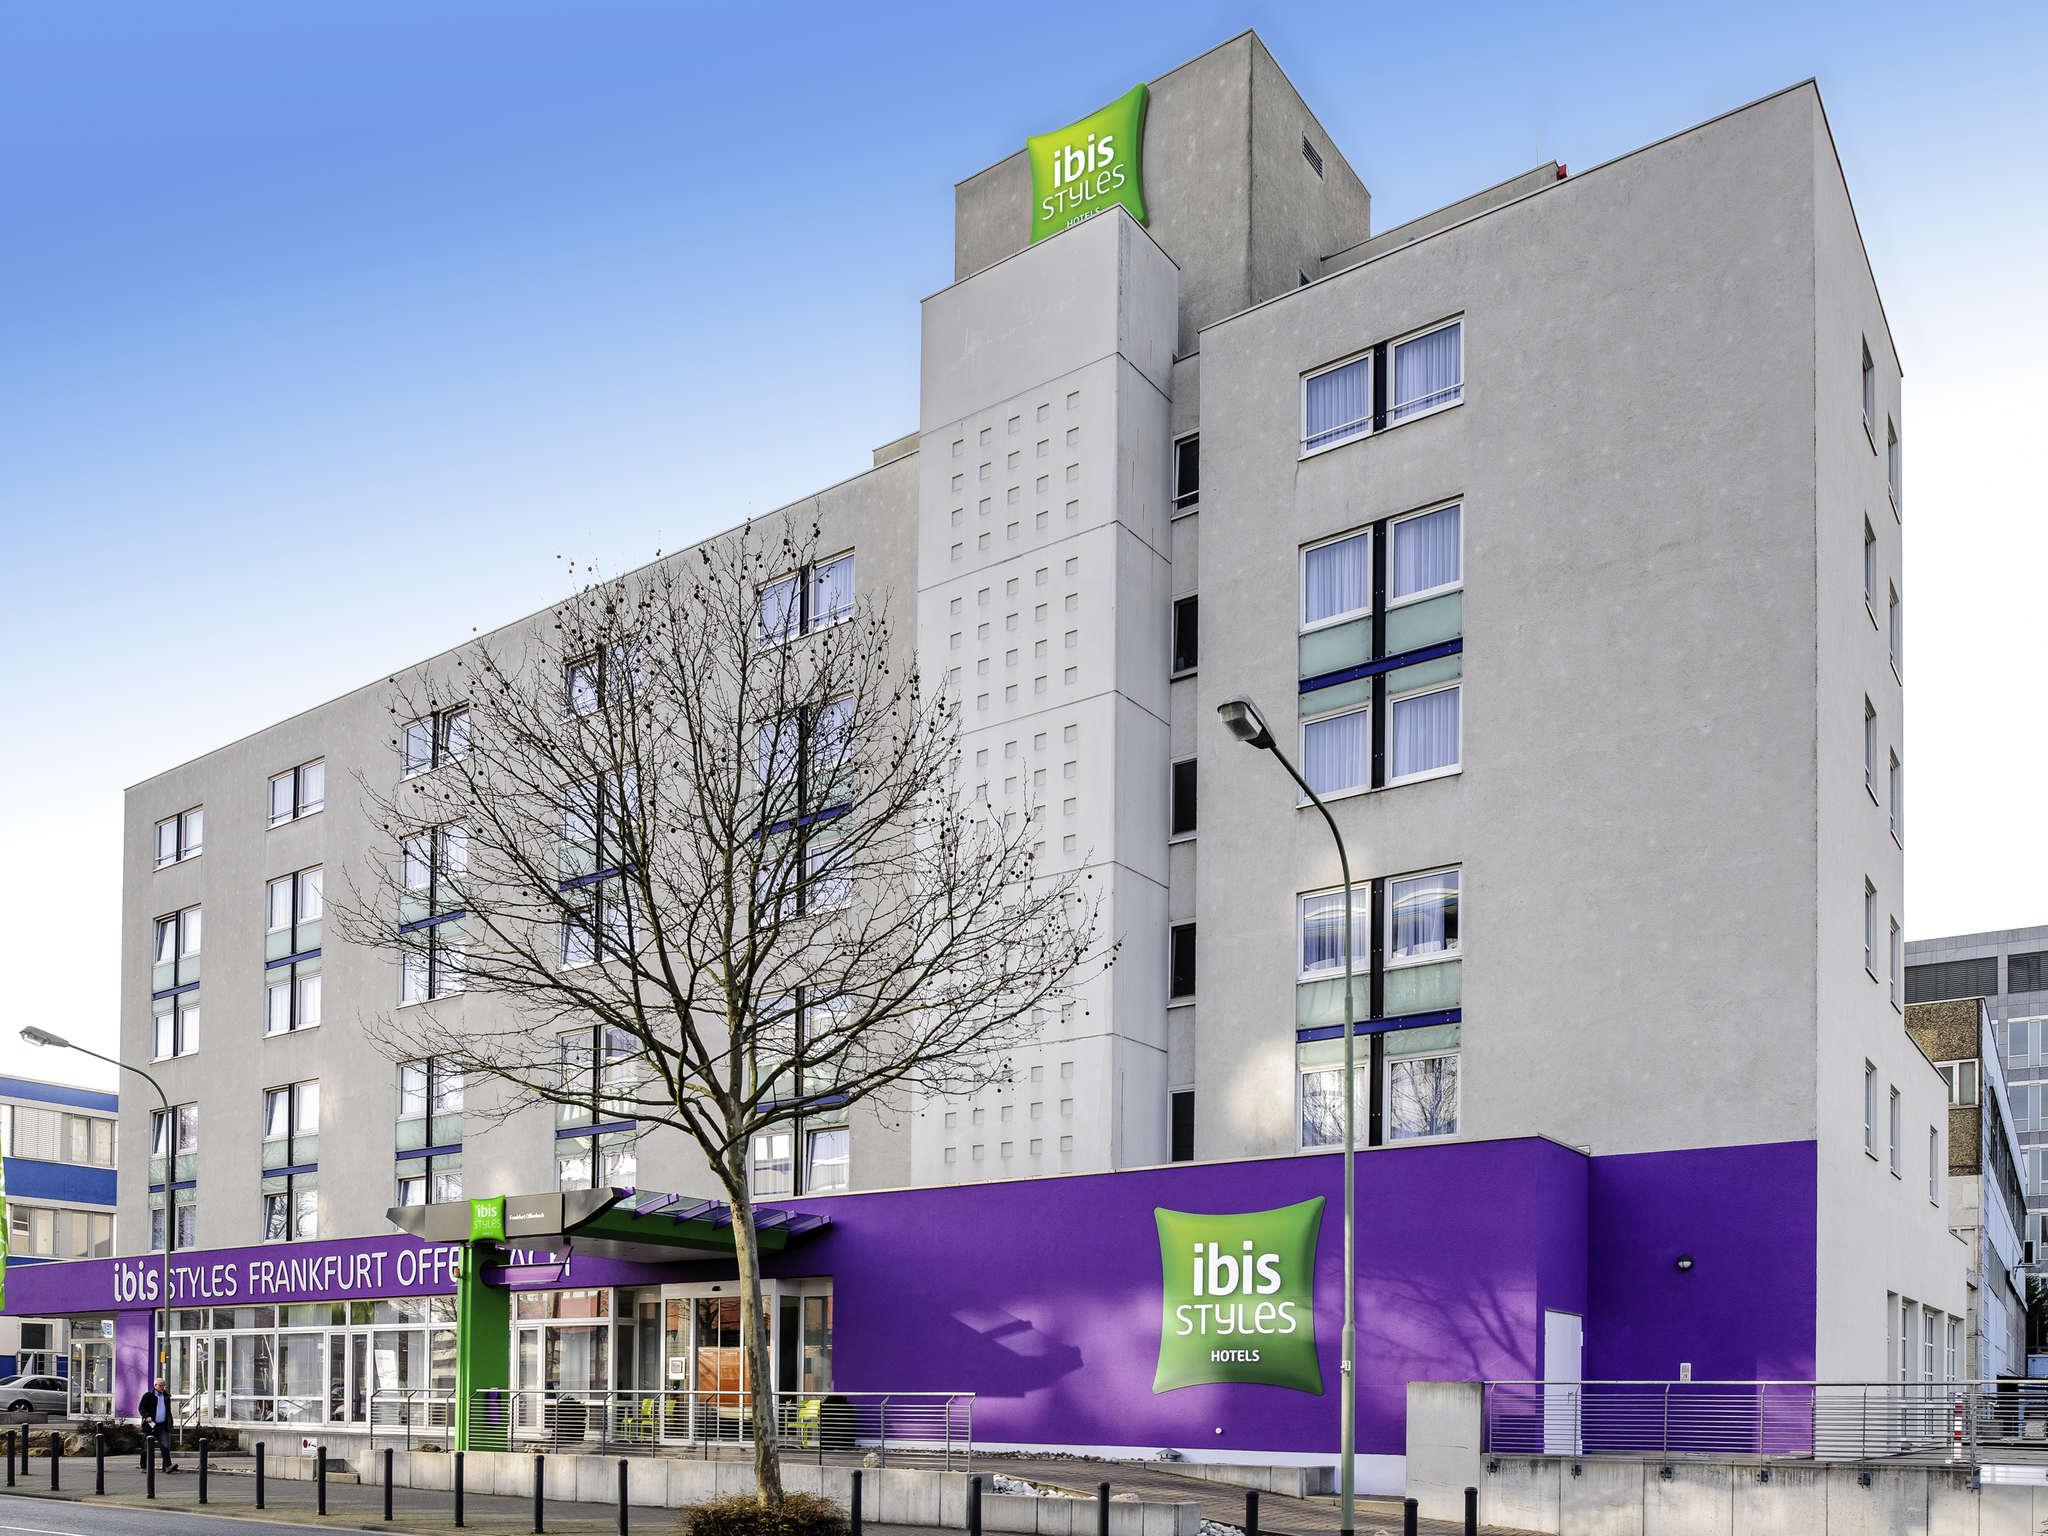 Hotel Ibis Styles Frankfurt Offenbach